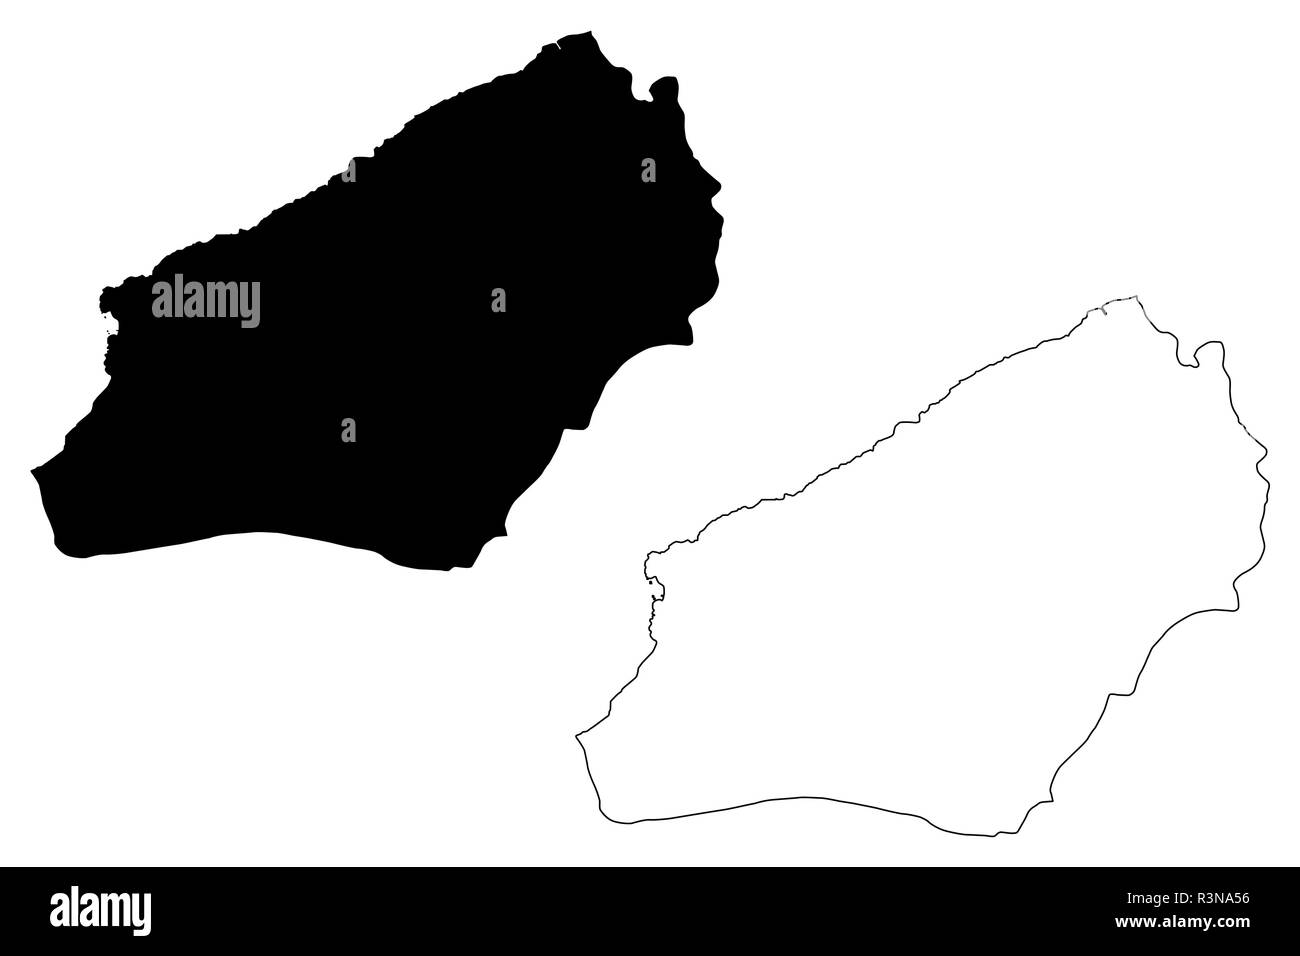 Zonguldak (Provinces of the Republic of Turkey) map vector illustration, scribble sketch Zonguldak ili map - Stock Image